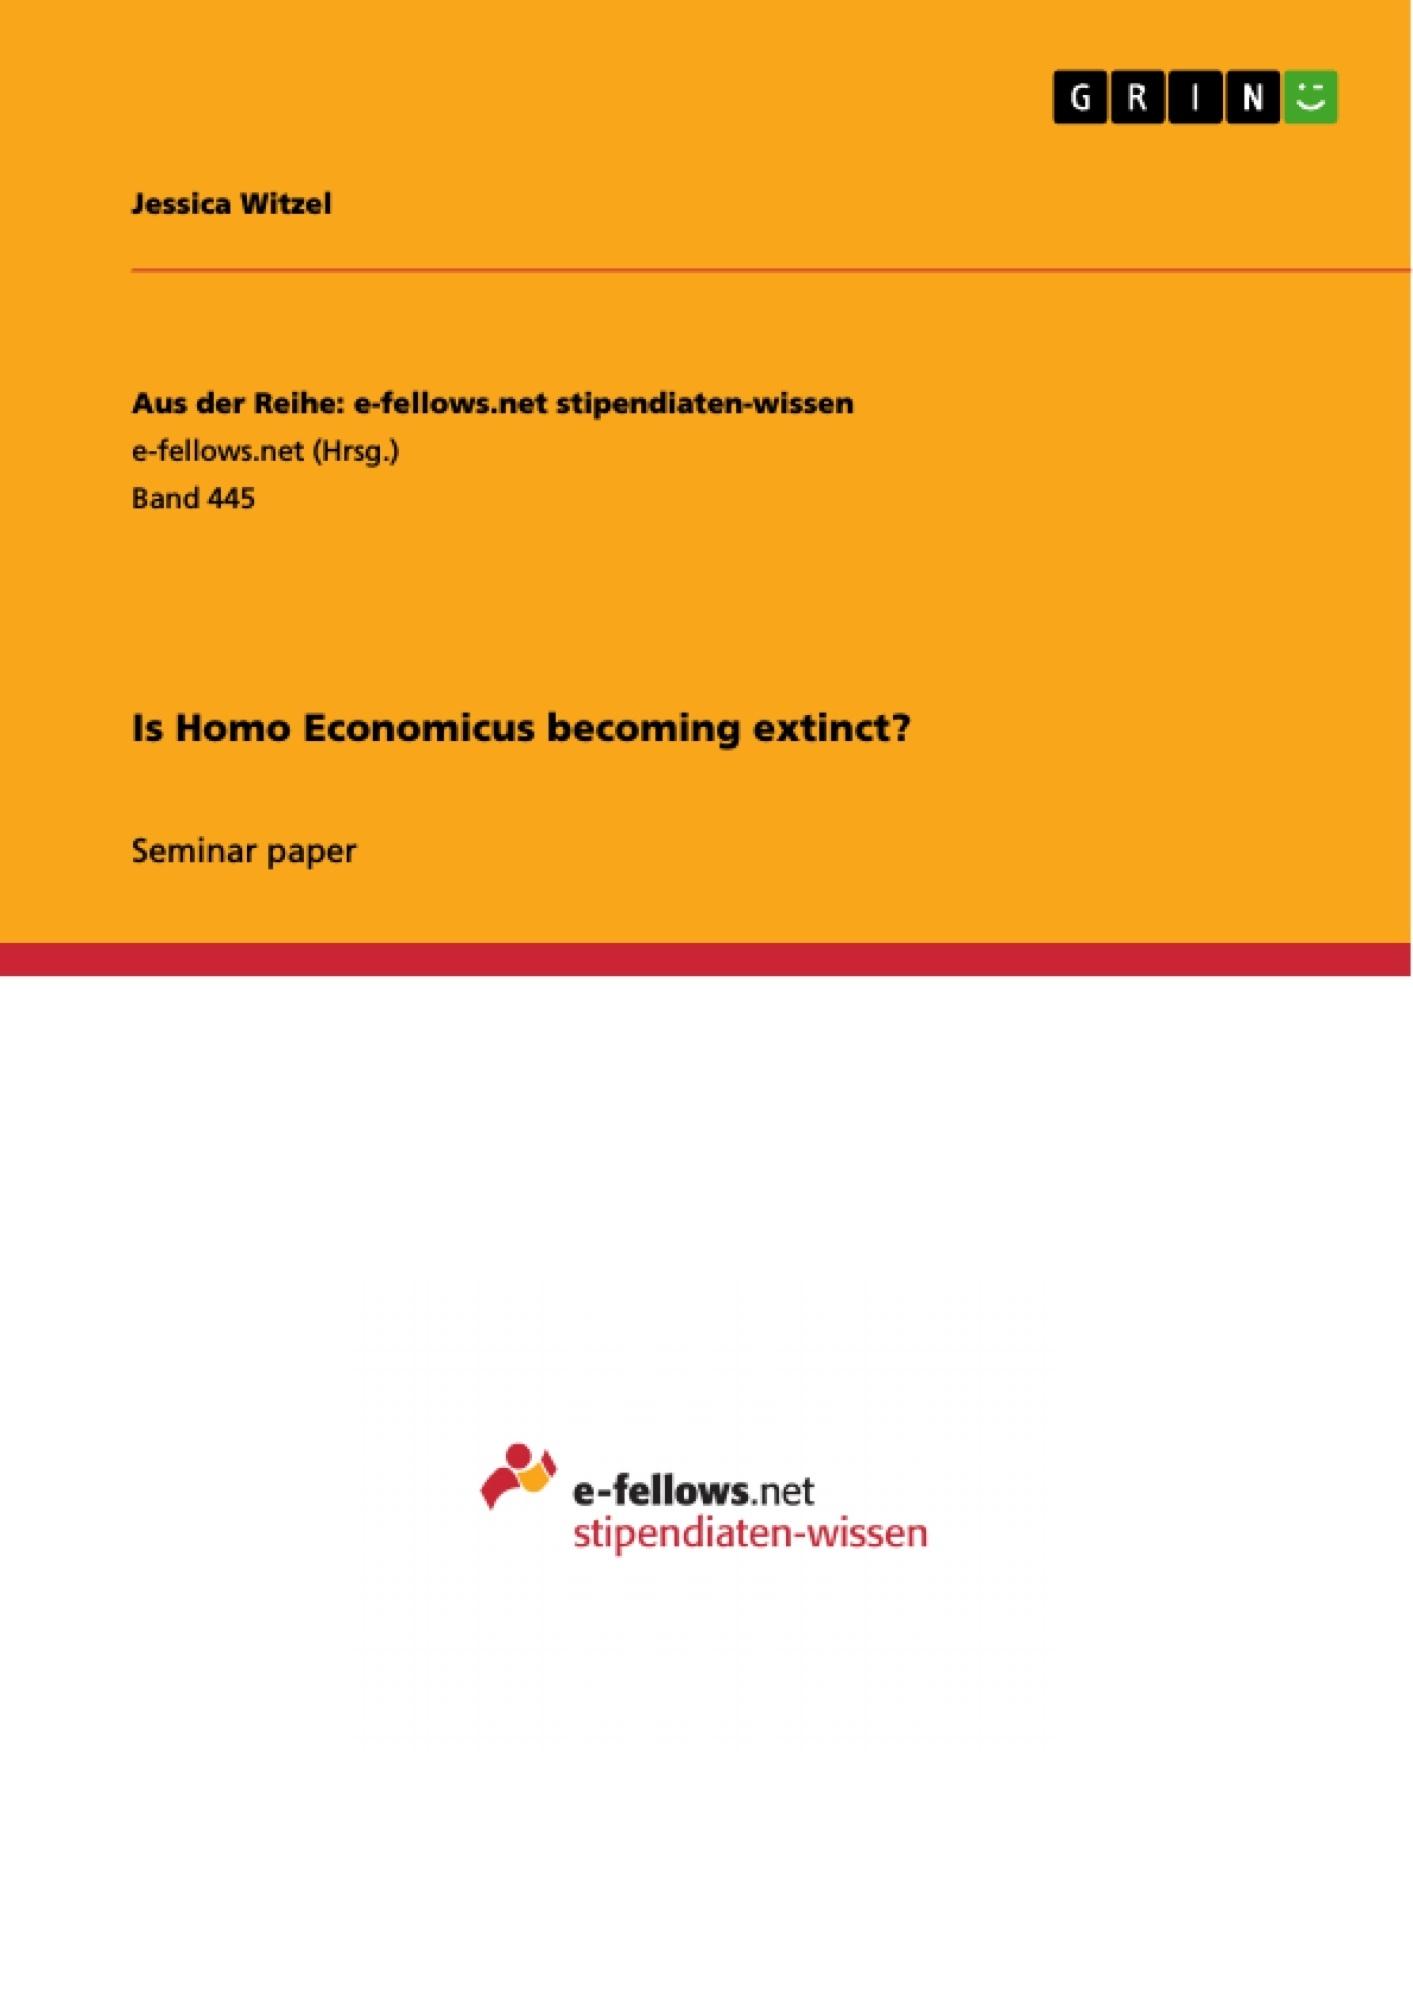 Title: Is Homo Economicus becoming extinct?